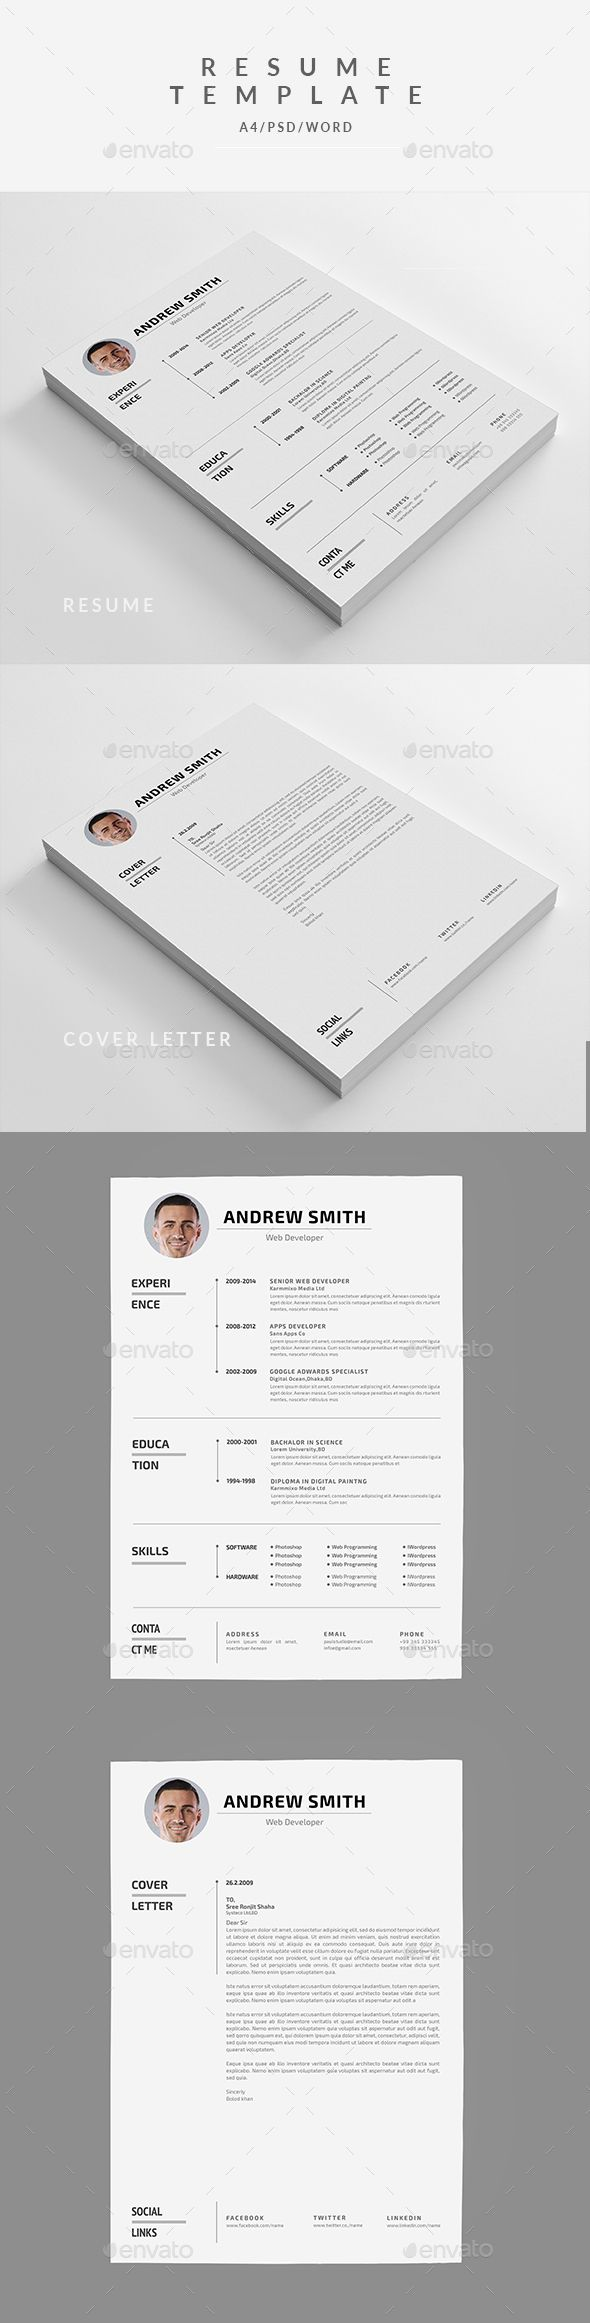 220 Best Resume Curriculum Vitae Images On Pinterest Resume